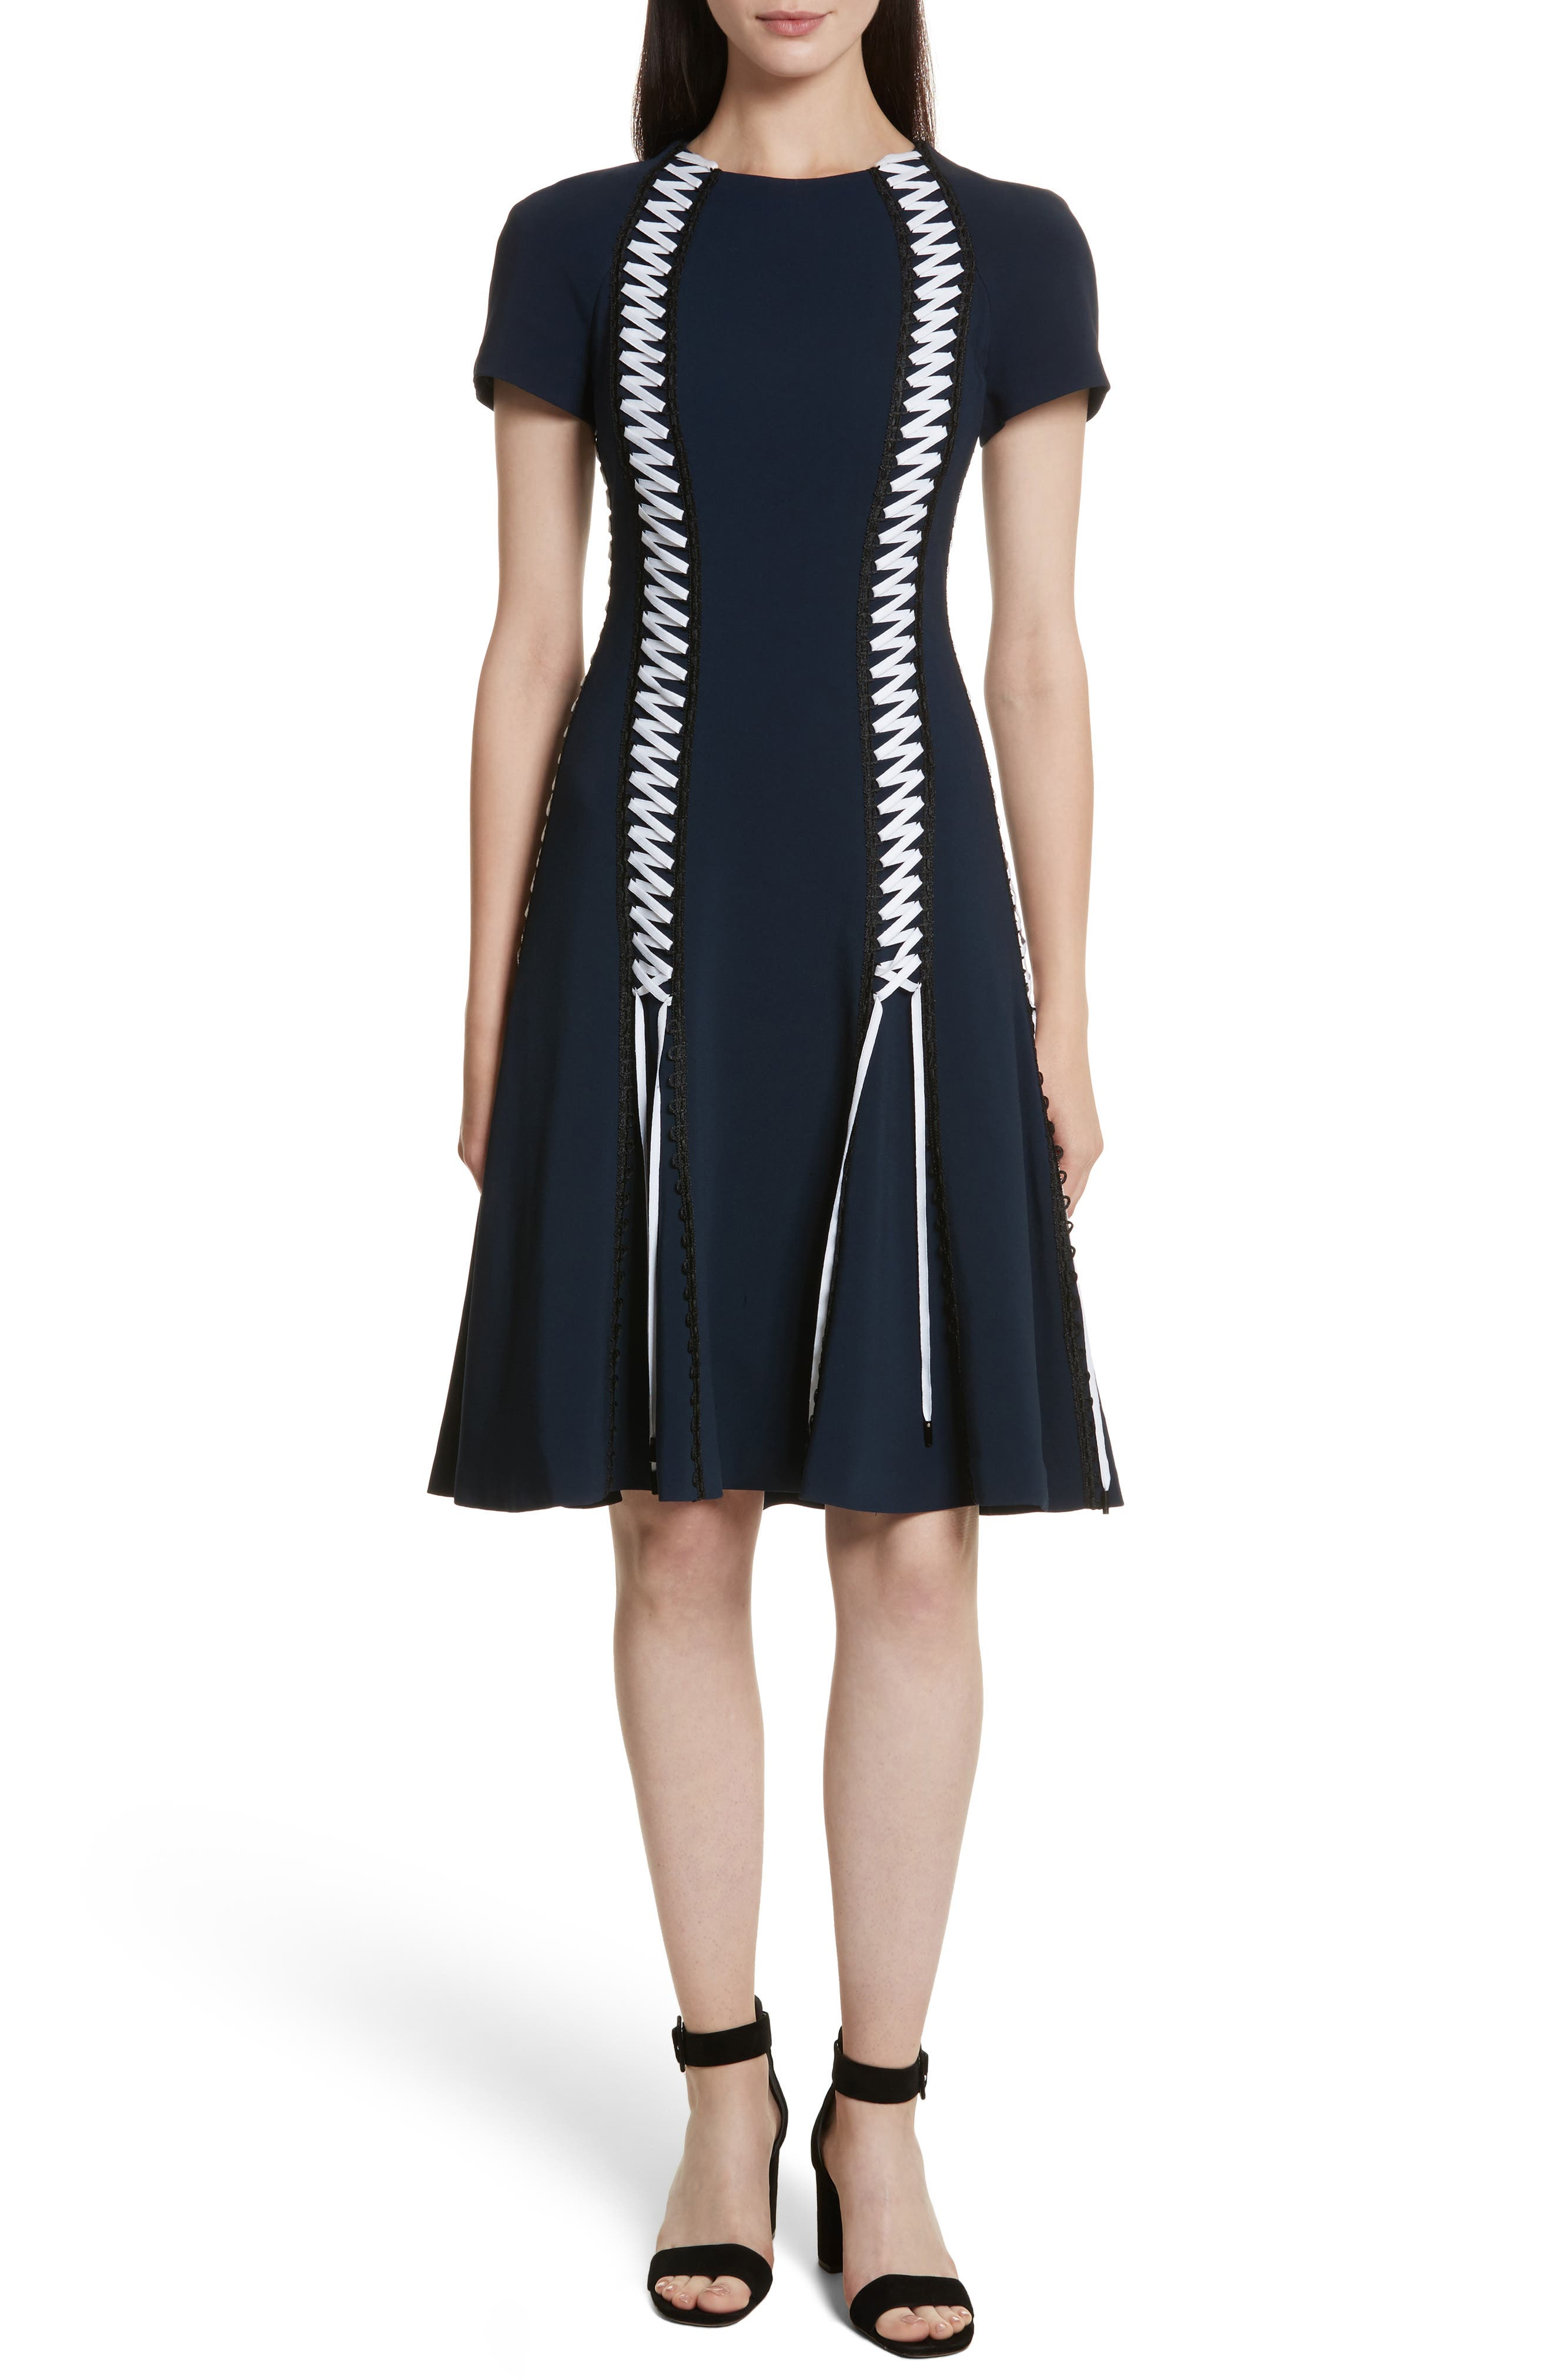 Main Image - Jonathan Simkhai Lace-Up Crepe Dress